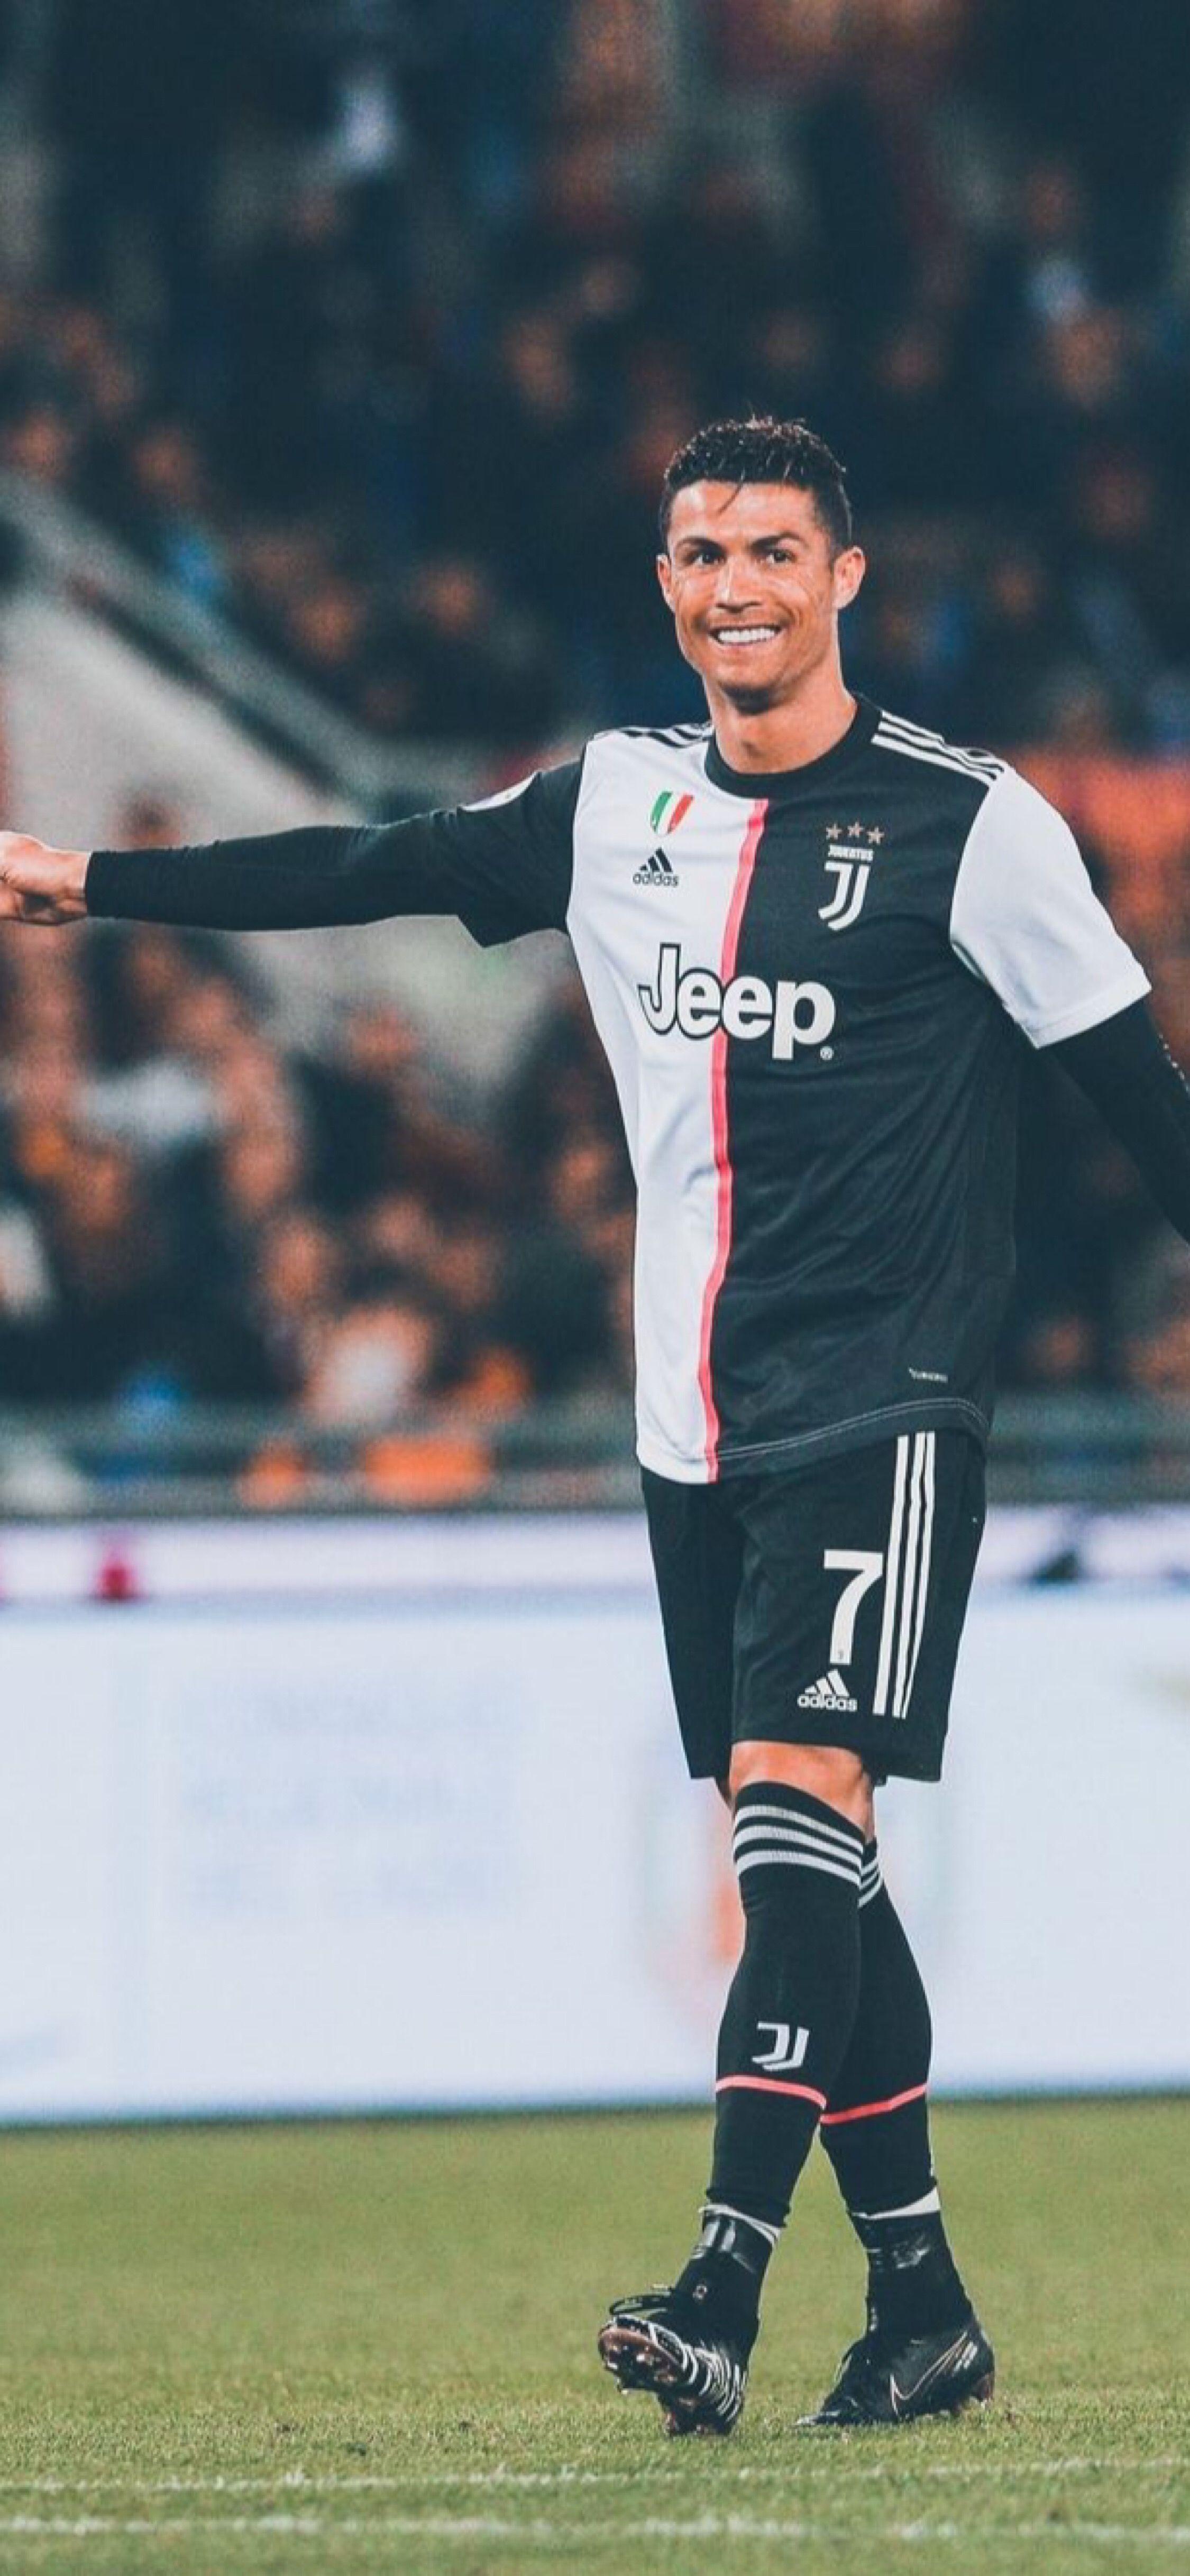 Ronaldo Football Cristiano Ronaldo Ronaldo